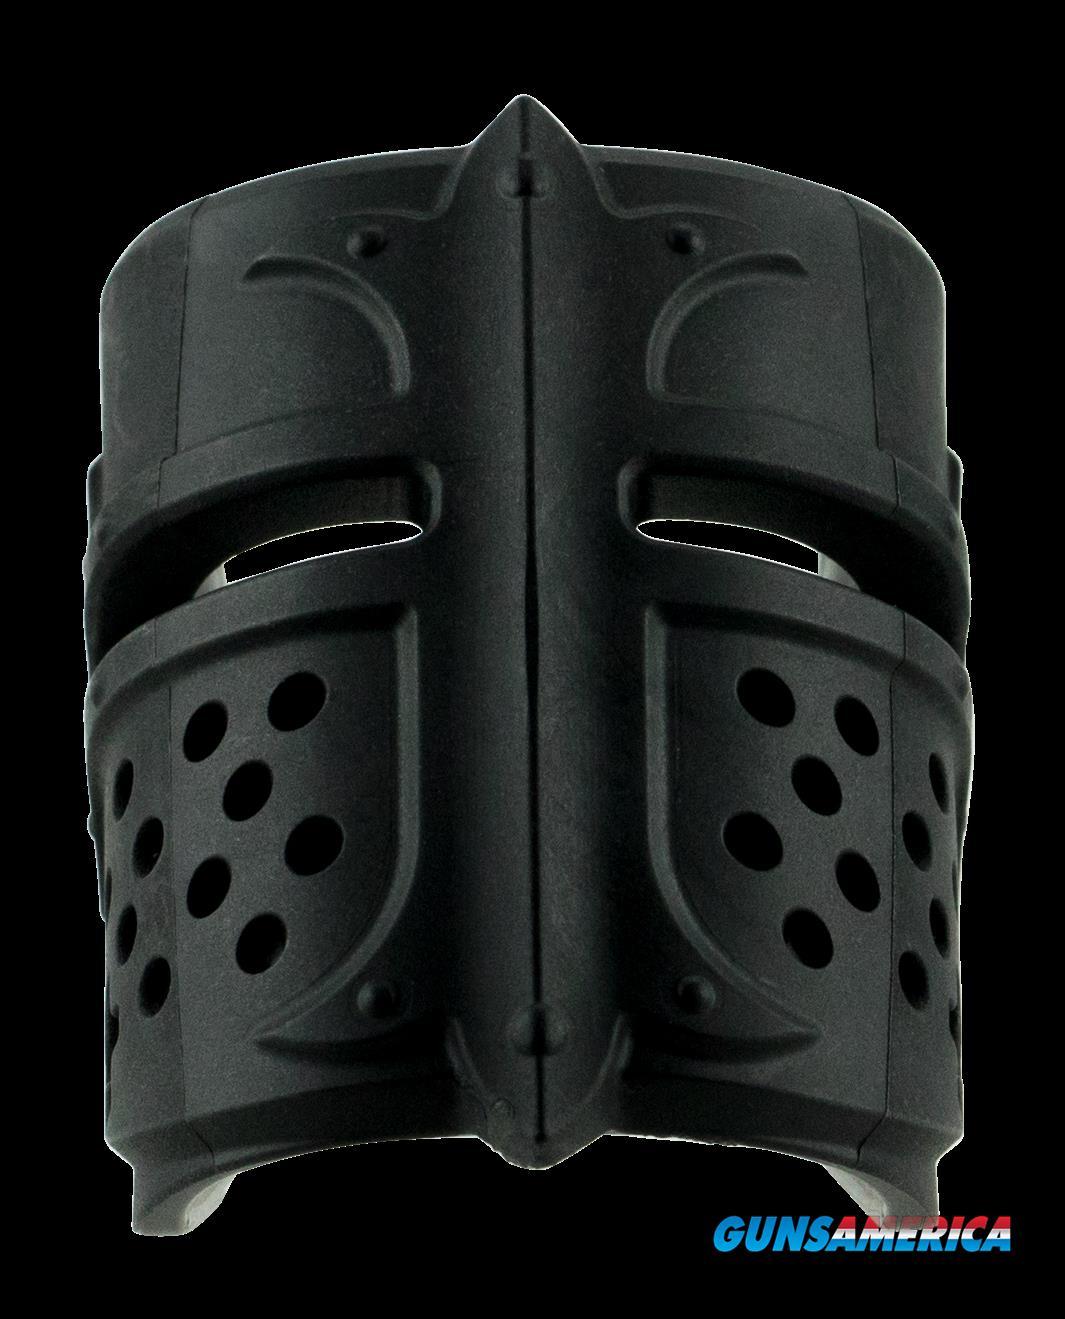 Fab Defense (usiq) Mojo, Fab Fx-mojo-cavb  Mojo Magwell Mask Crusader Blk  Guns > Pistols > 1911 Pistol Copies (non-Colt)